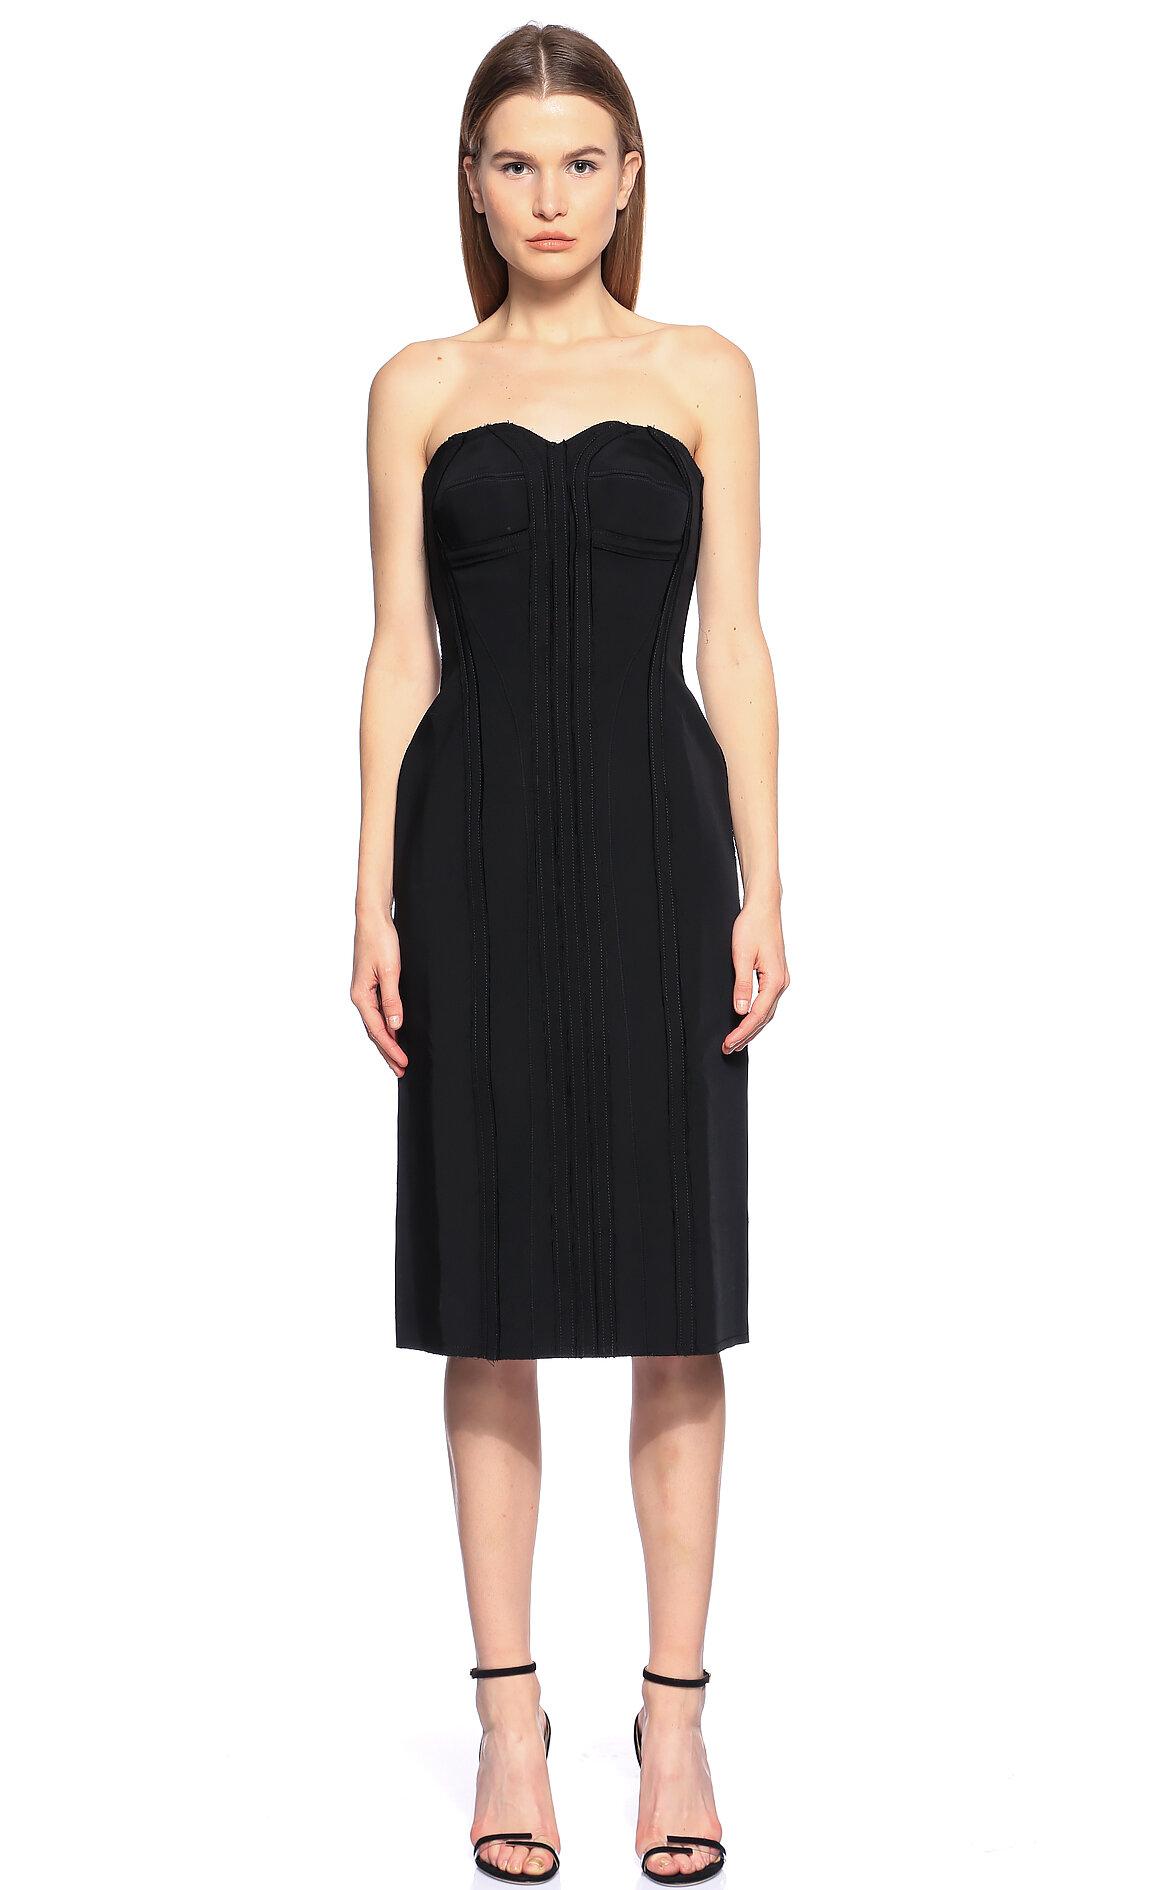 Lanvin-Lanvin Straplez Siyah Elbise